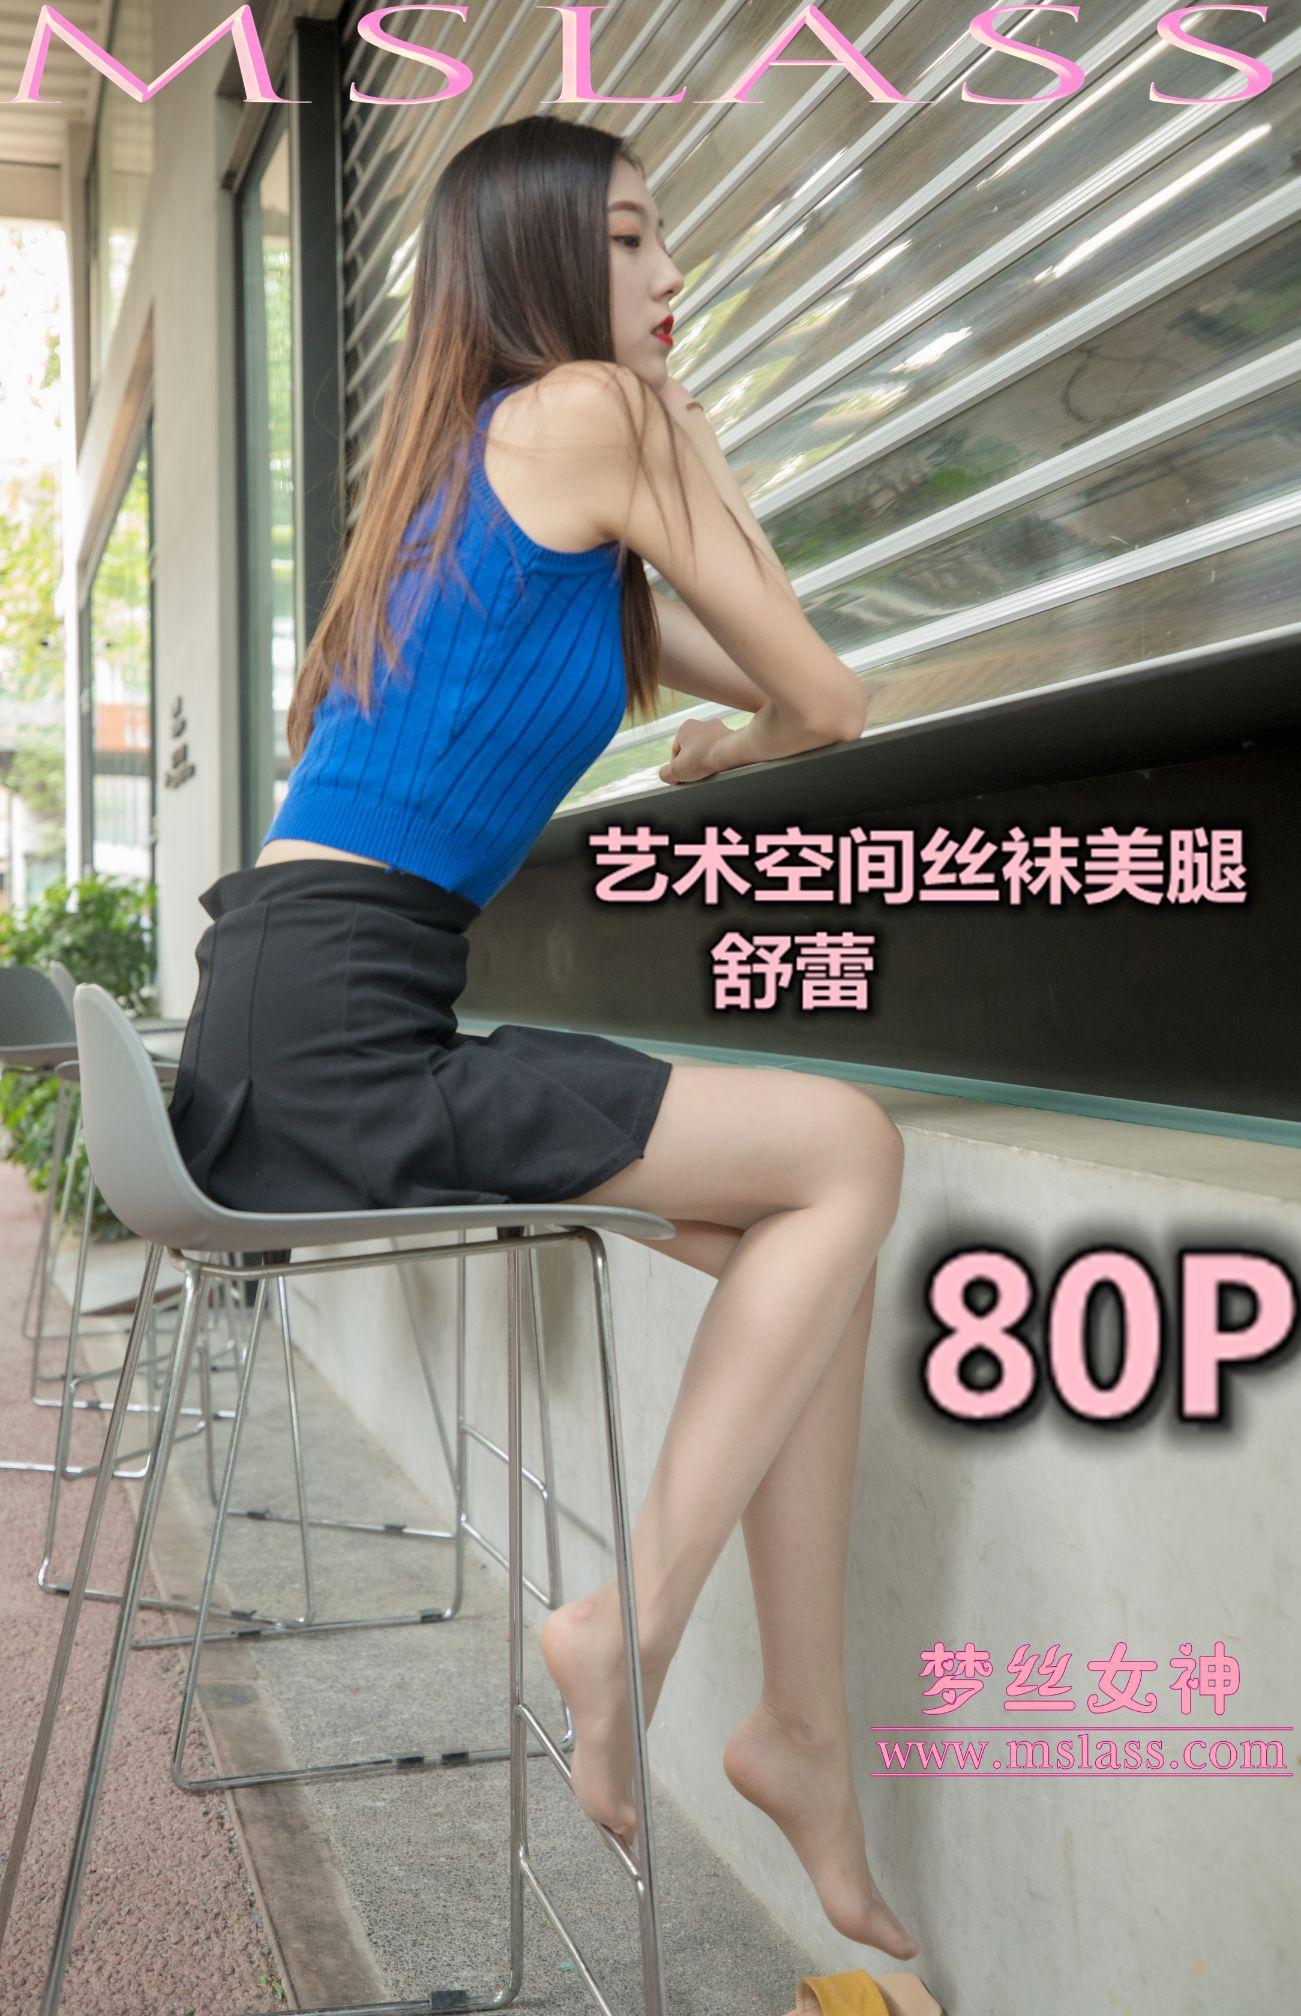 [MSLASS]夢絲女神 - 舒蕾(Shū lěi) 藝術空間絲襪美腿 [ 80P] - 貼圖 - 絲襪美腿 -